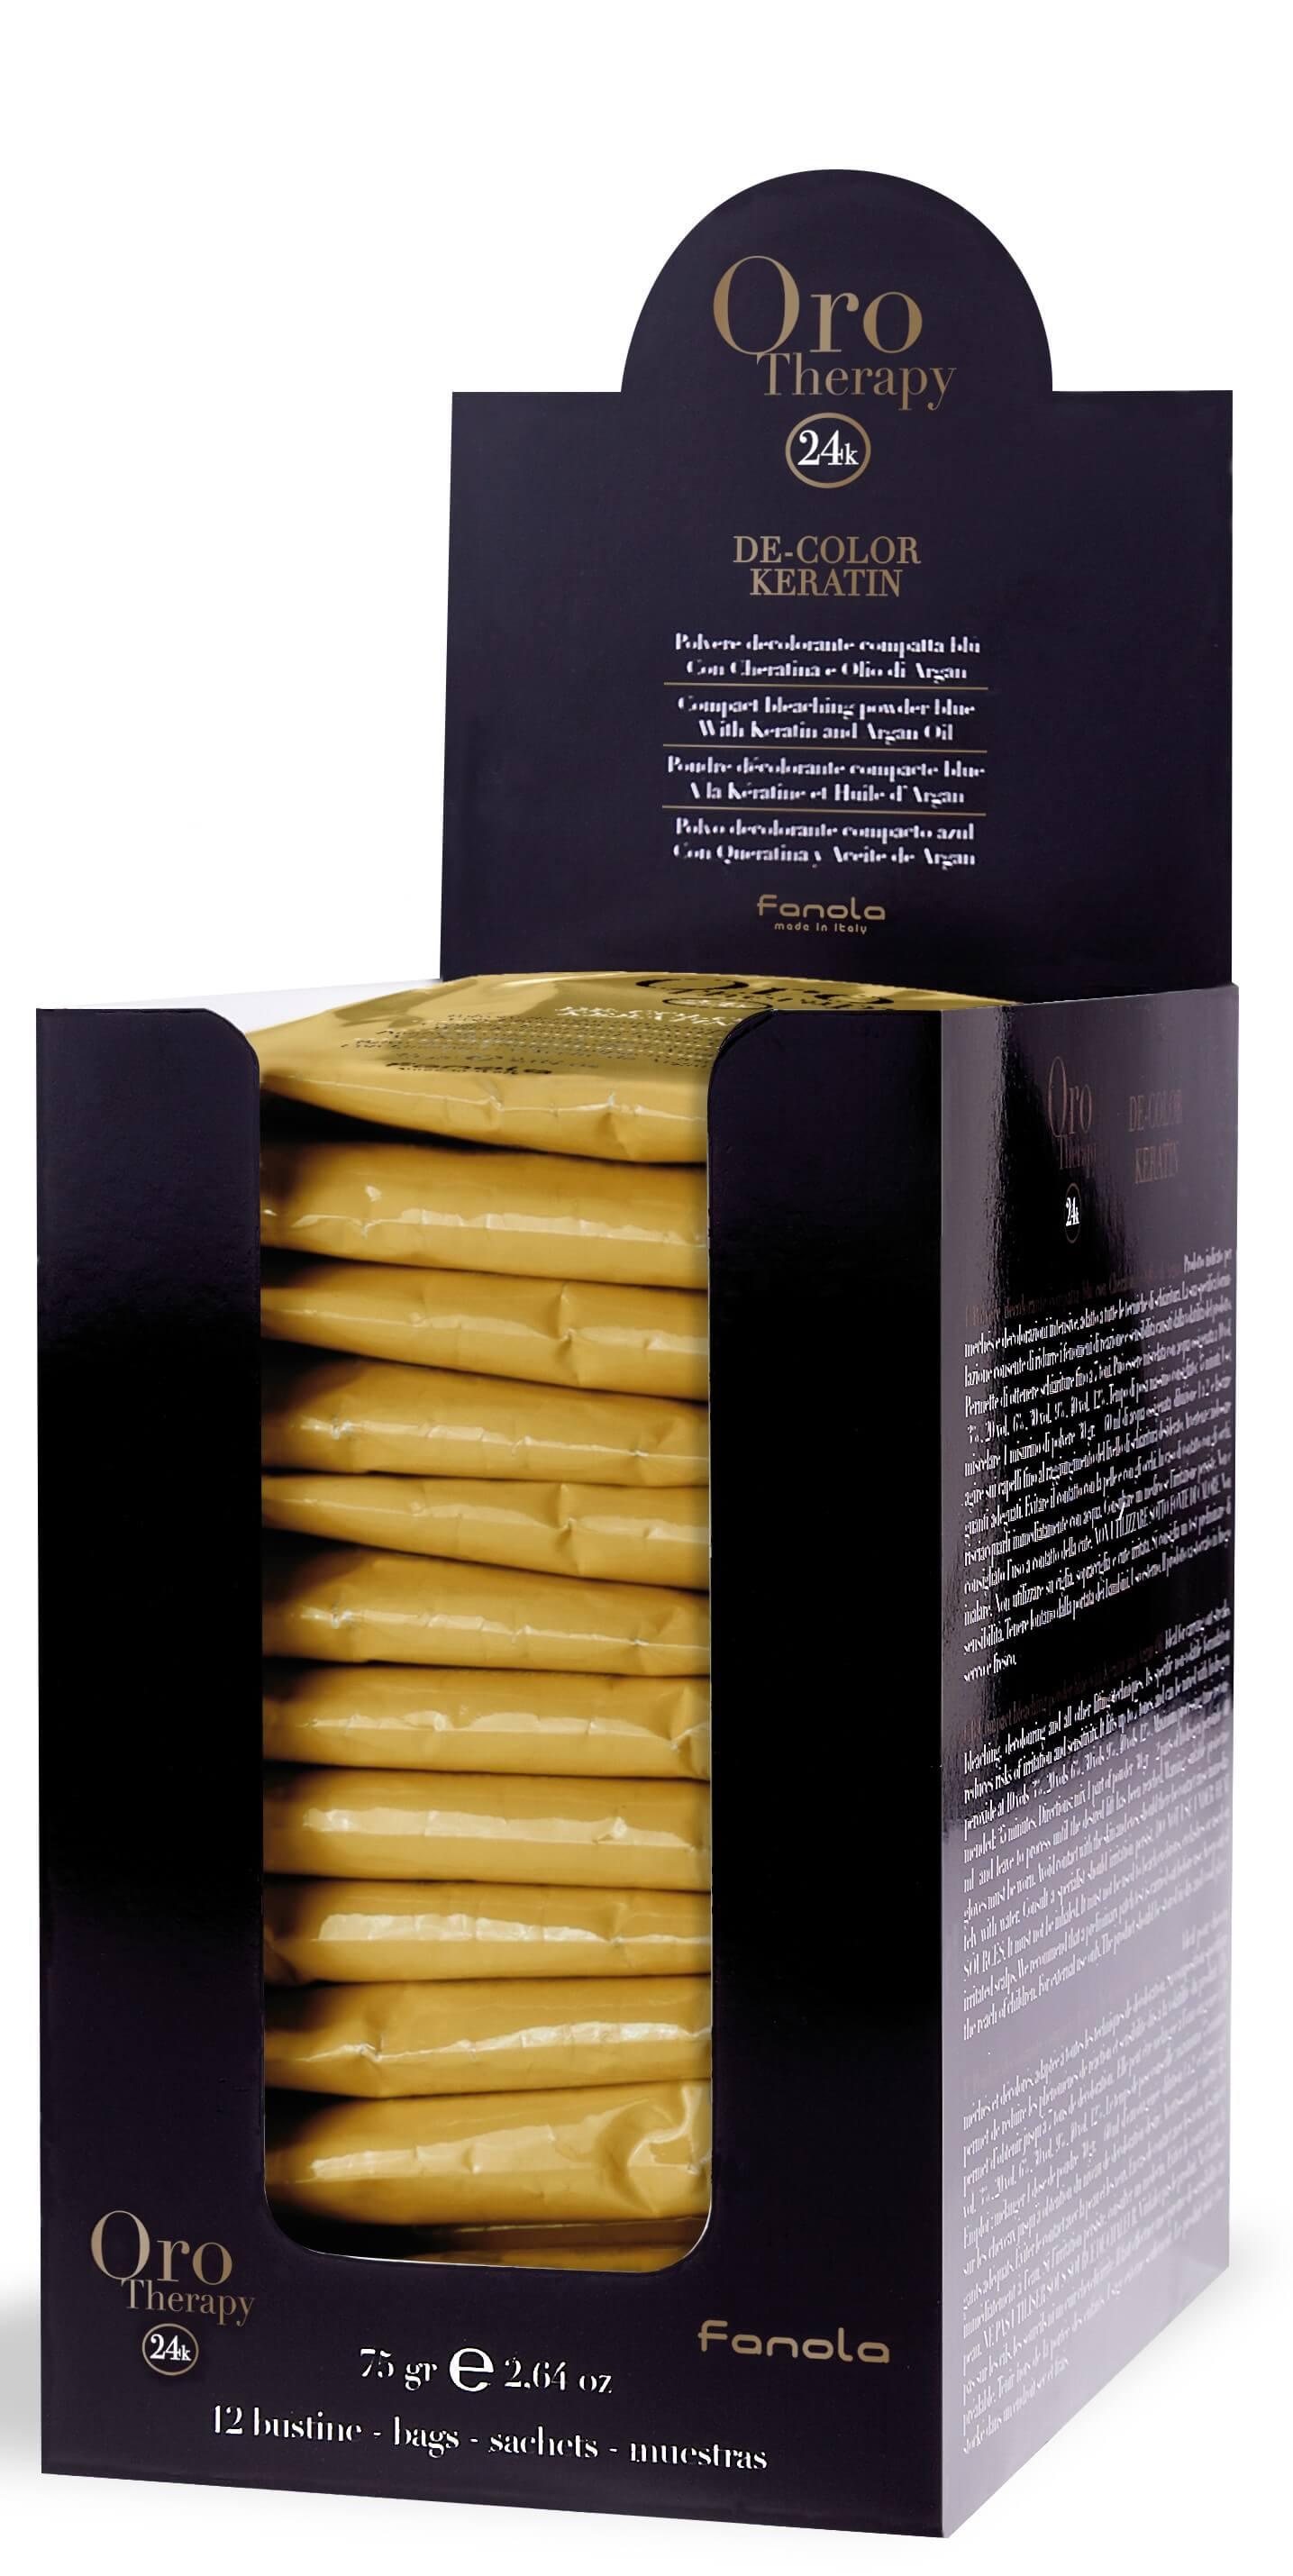 Fanola ORO PURO Therapy DE-Color Keratin Blondierpulver 12 x 75 g